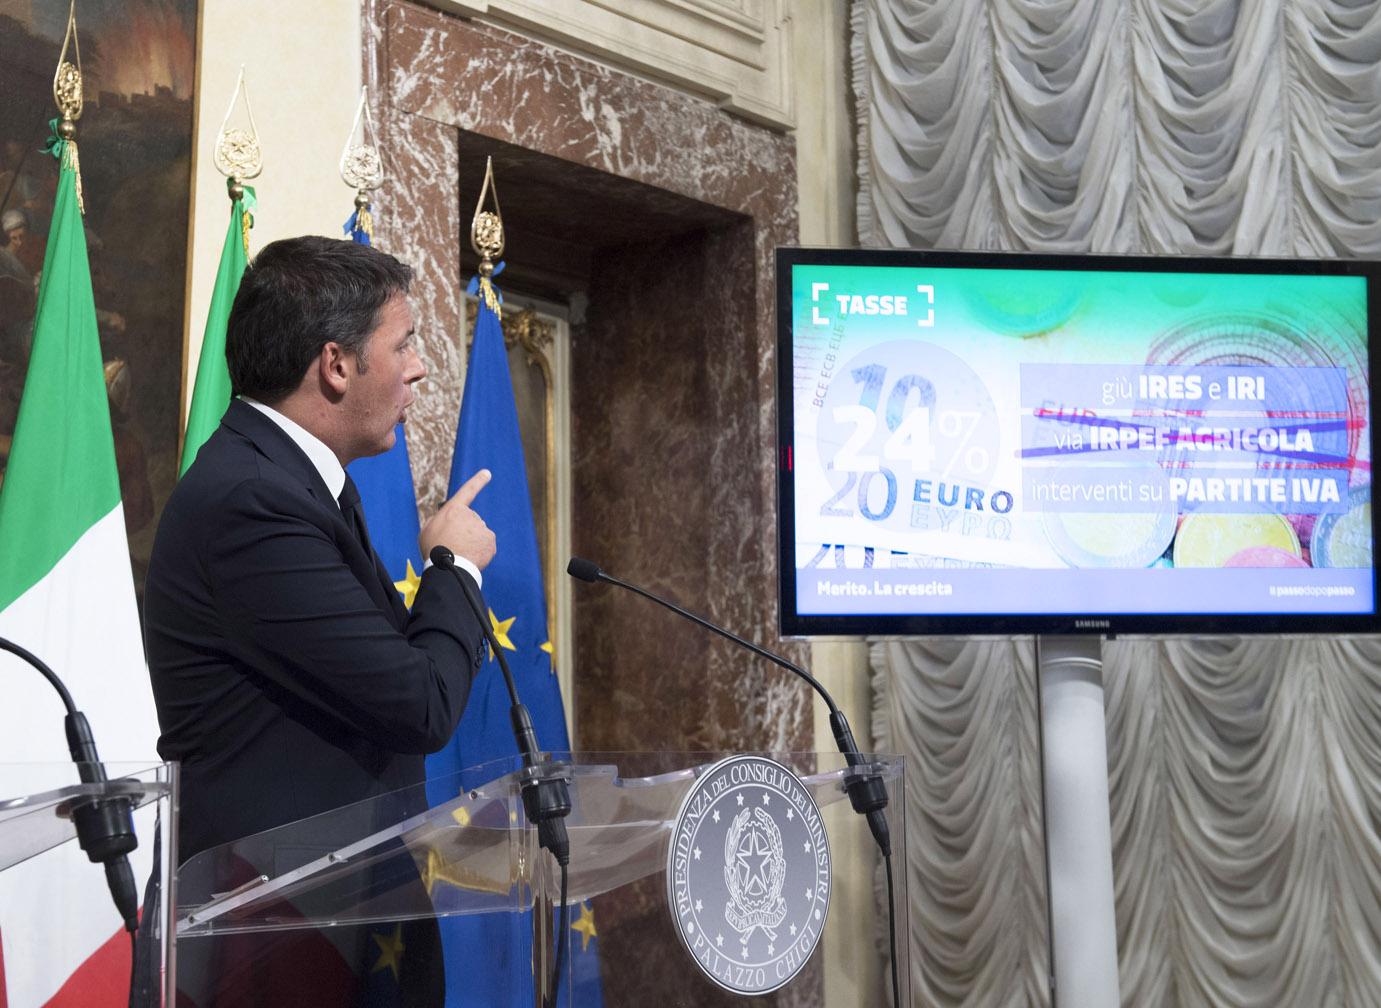 Governo - fonte: Palazzo Chigi